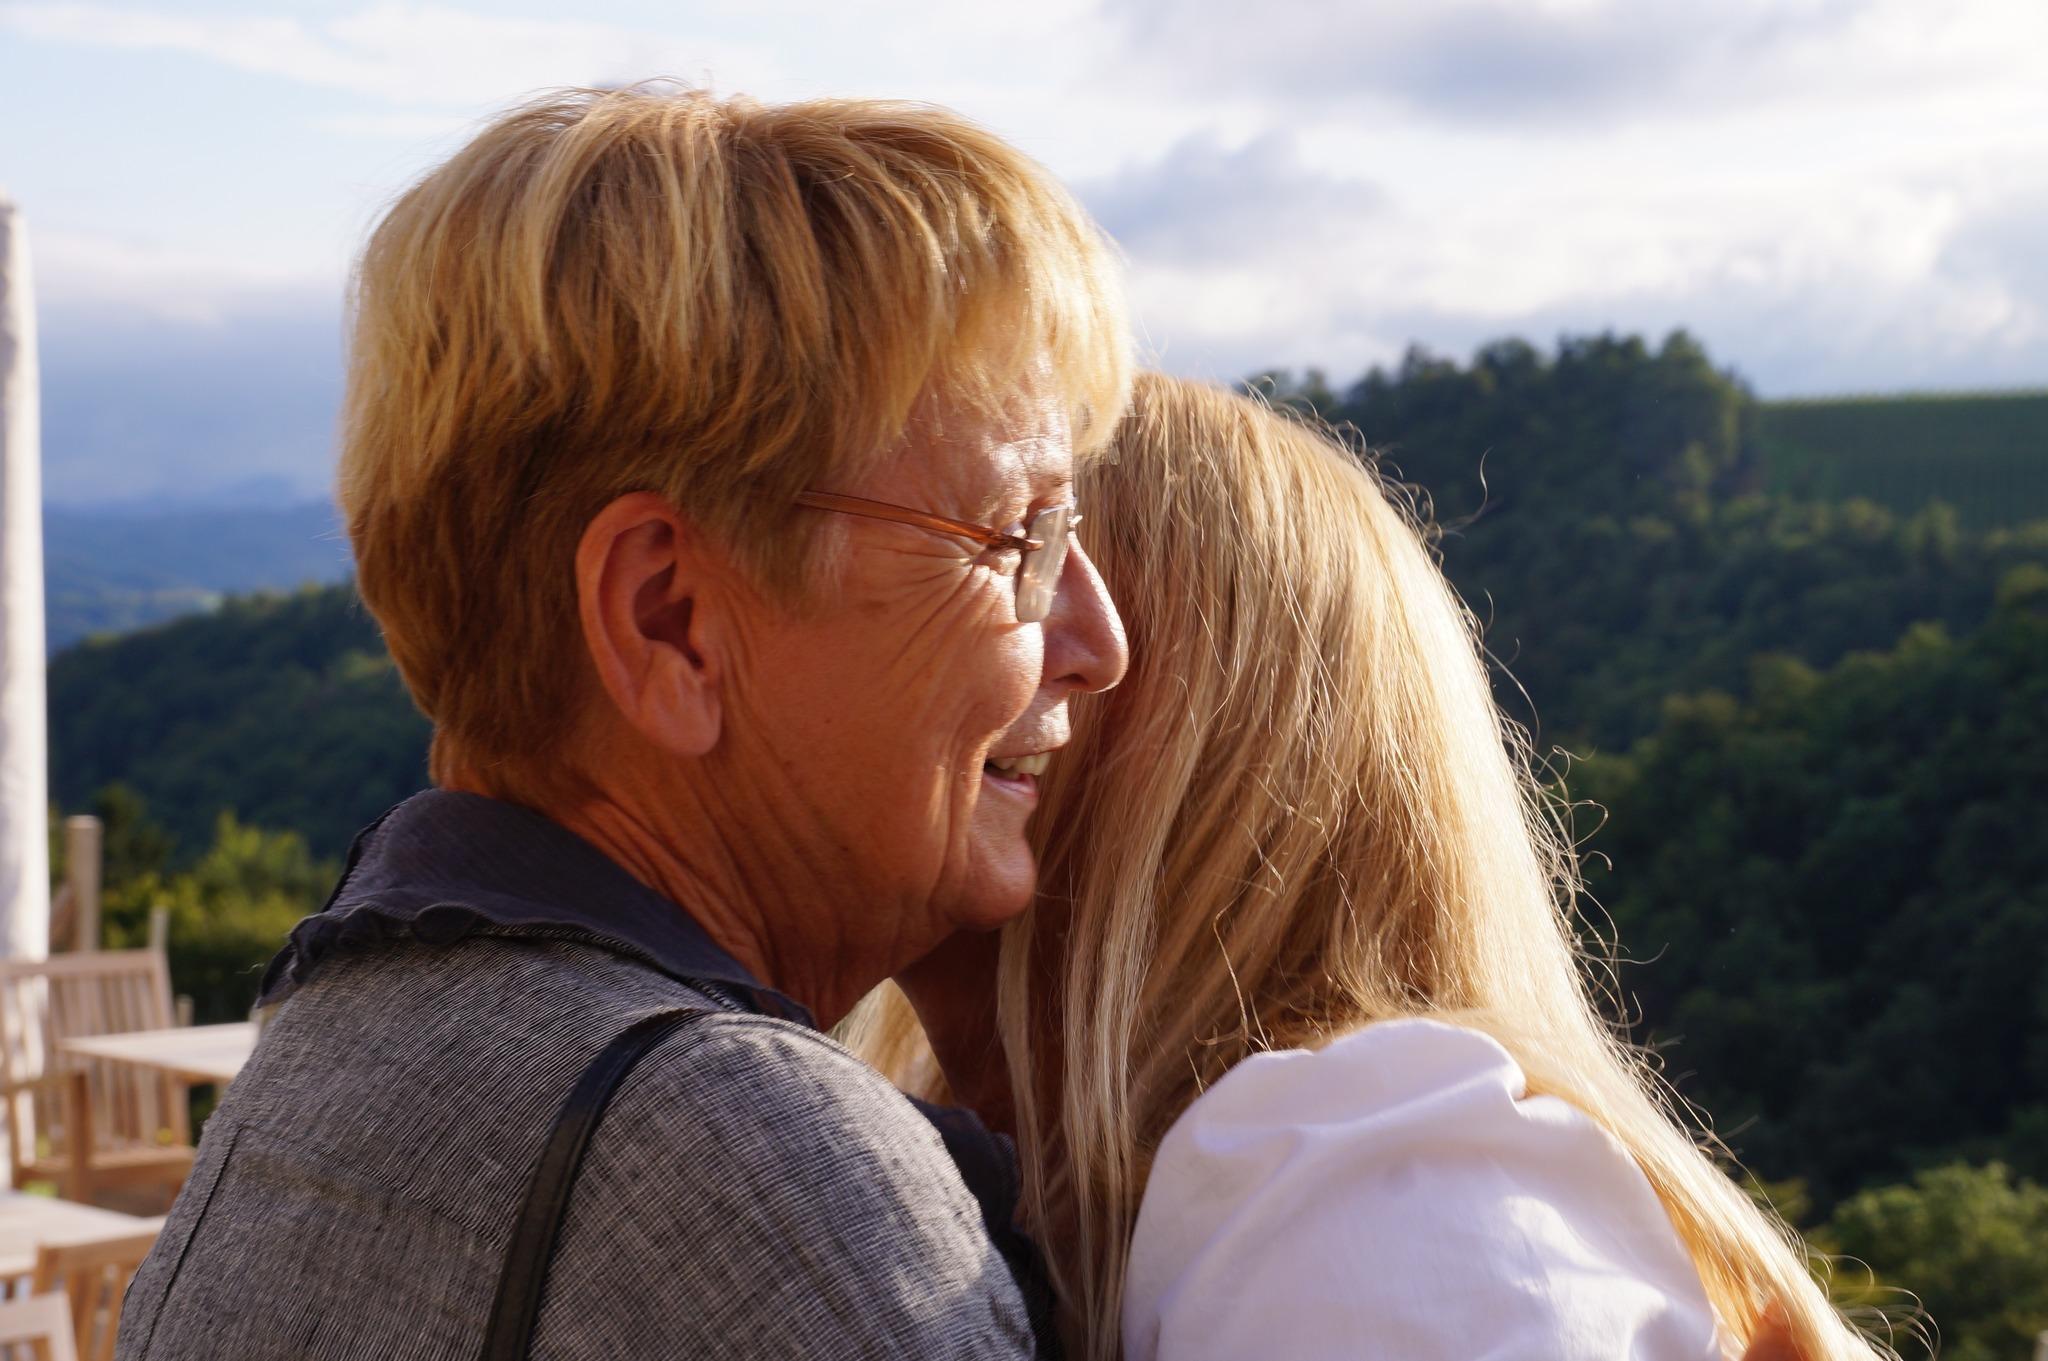 Exklusive partnervermittlung leibnitz: Sex kontakte gruppen